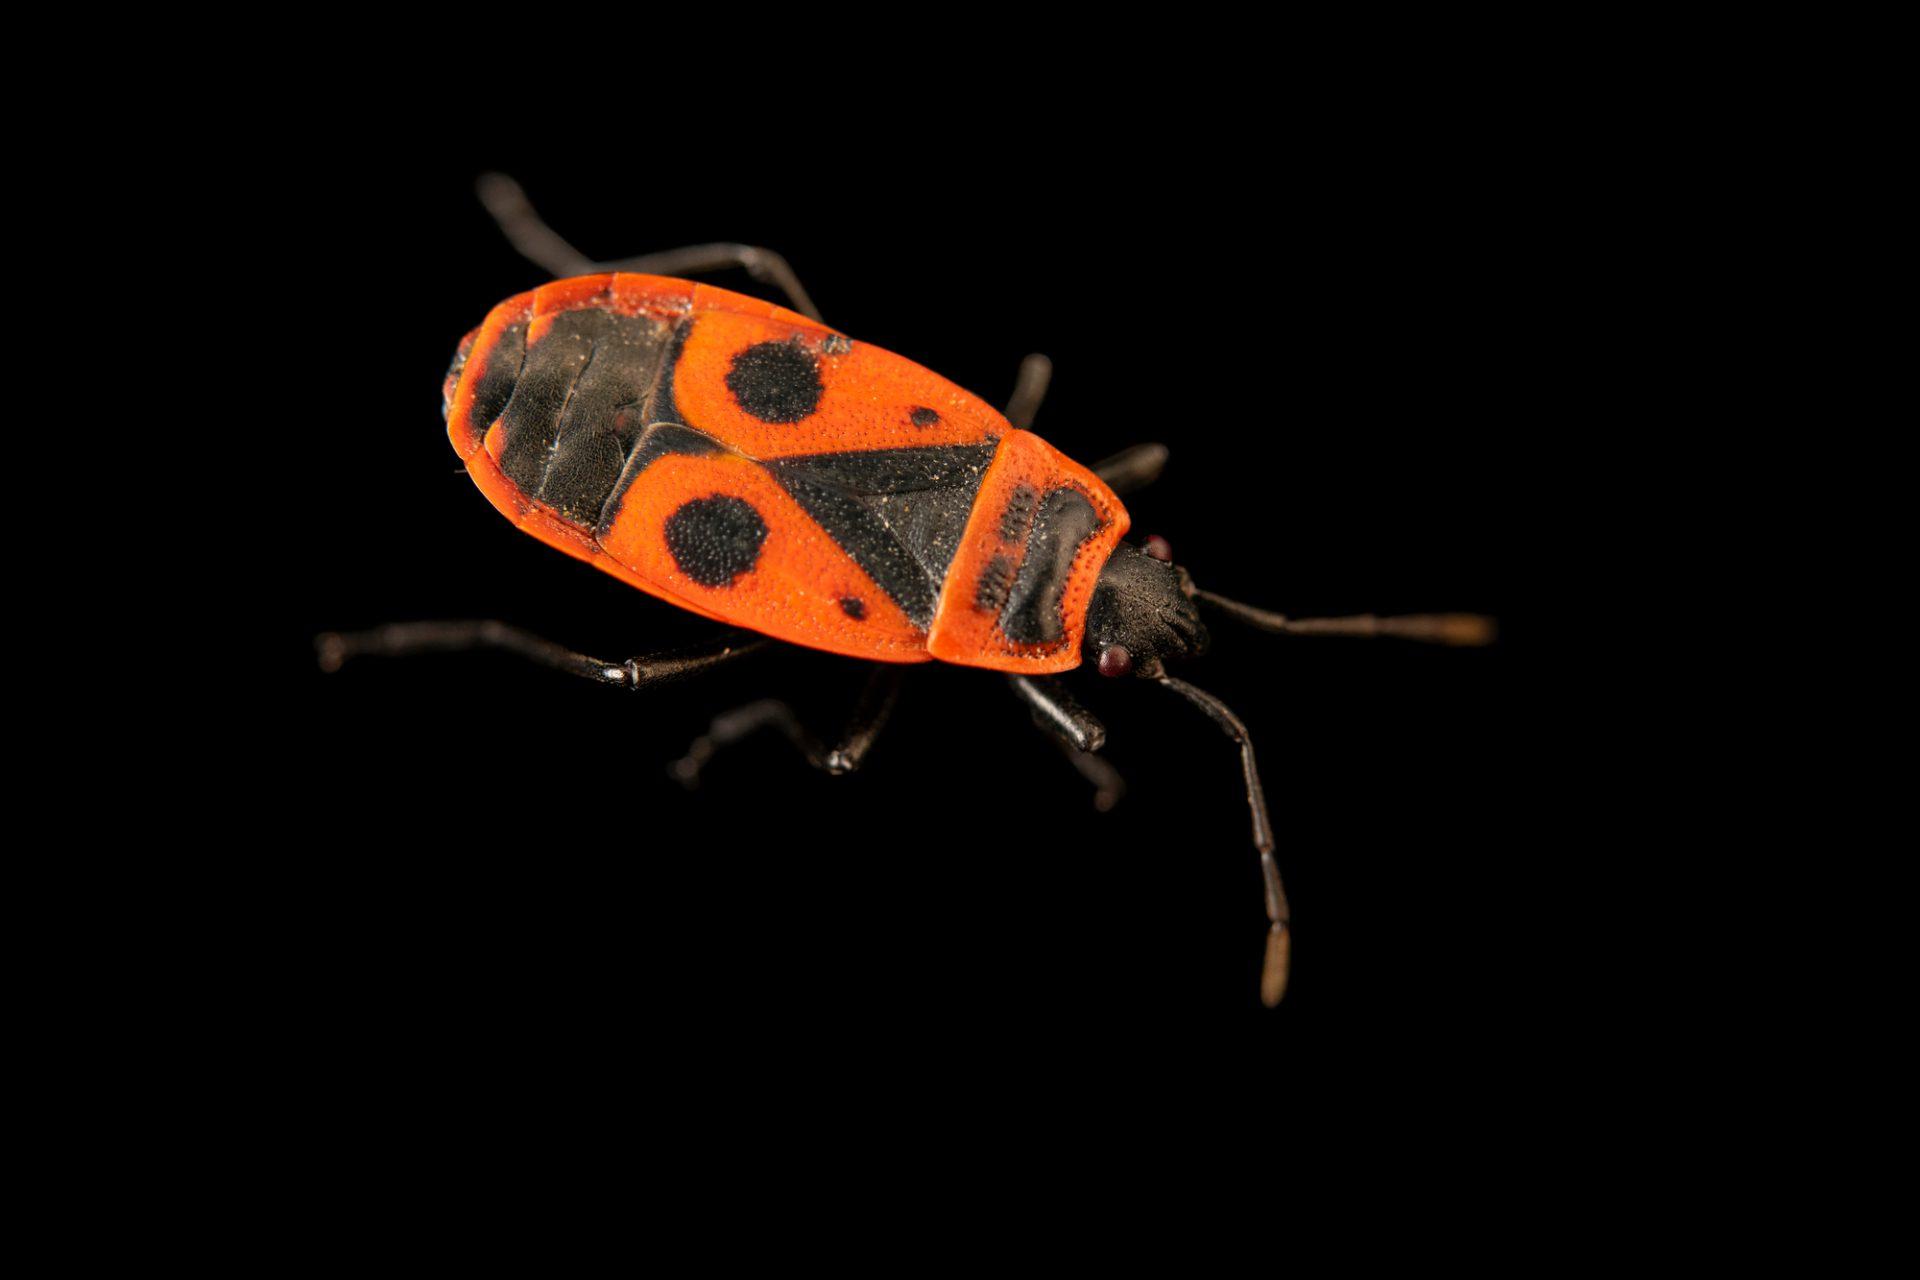 Photo: Fire bug (Pyrrhocoris apterus) at Graham's Quinta dos Malvedos Vineyard.